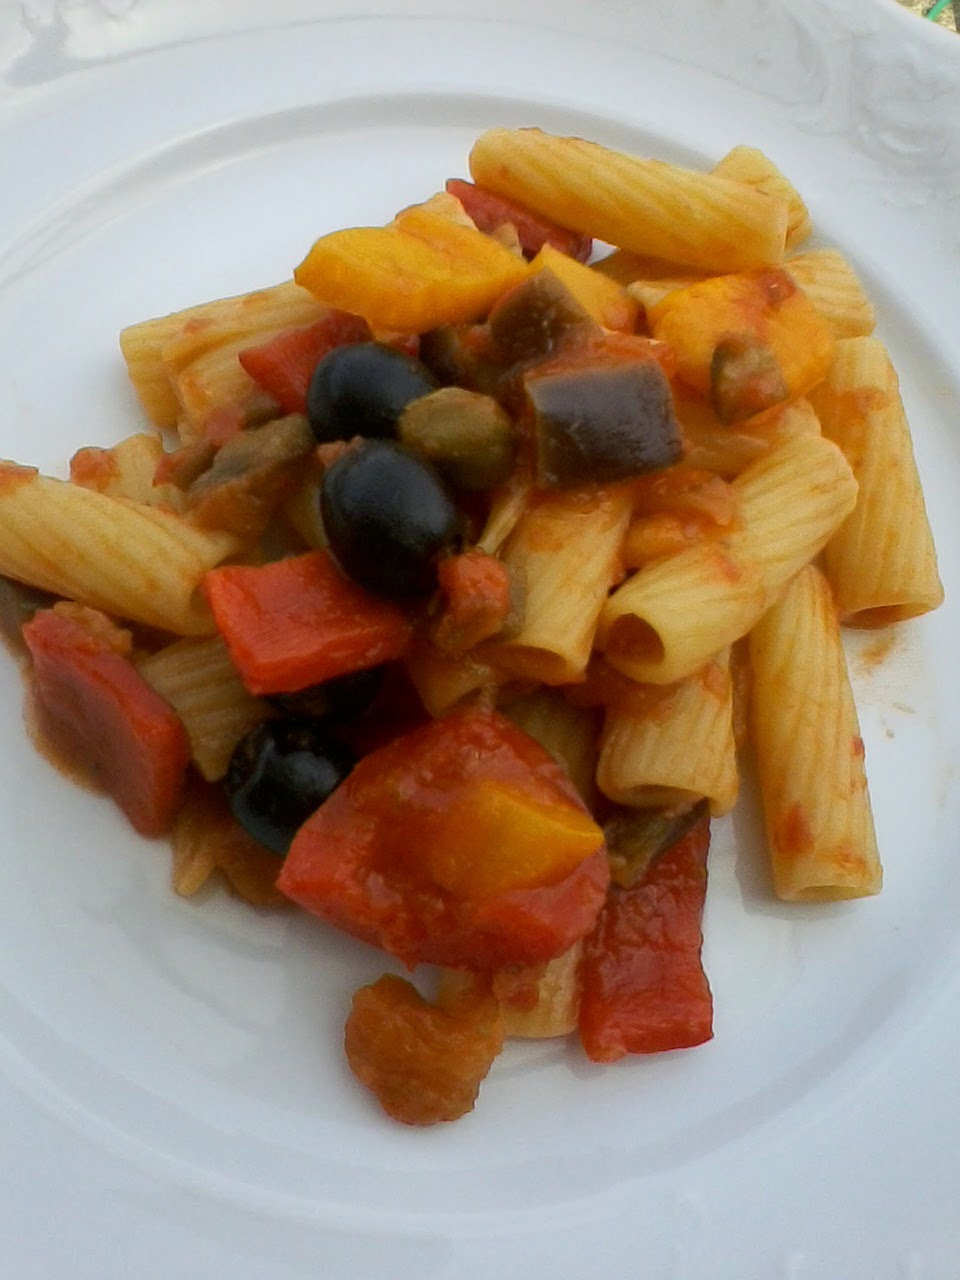 Cucina casalinga per imbranati tortiglioni alla siciliana - Cucina casalinga per cani dosi ...